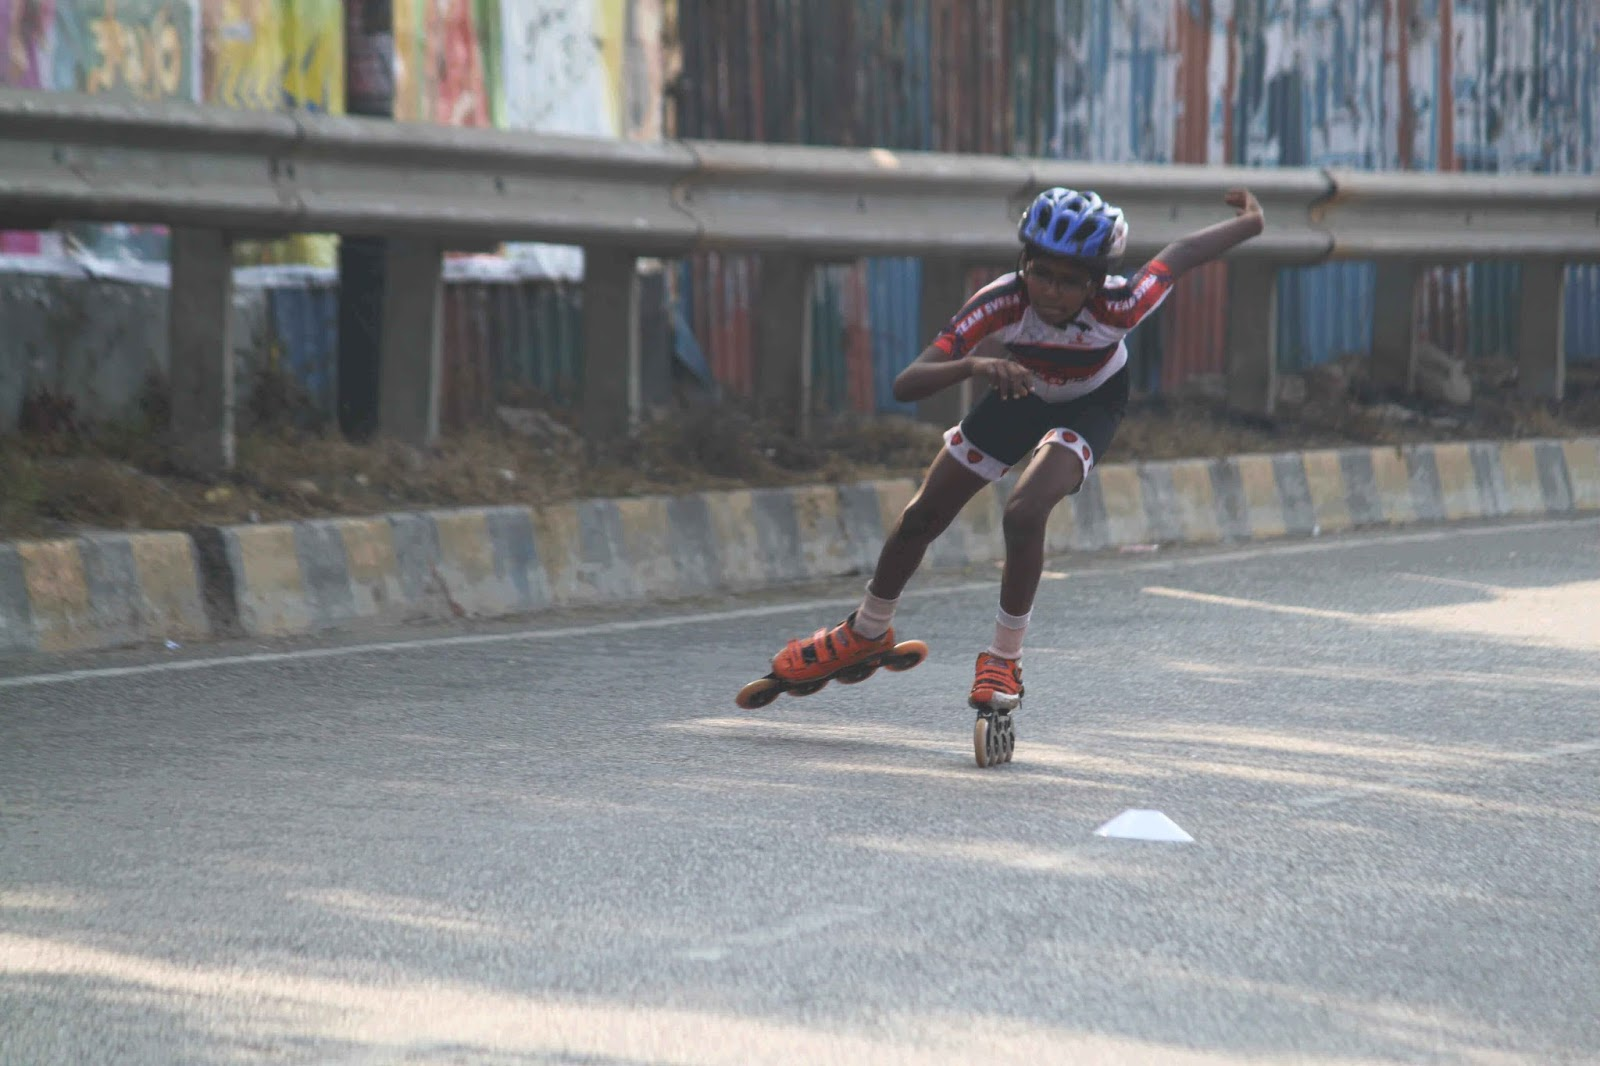 skating classes at miyapur in hyderabad black skate shoe